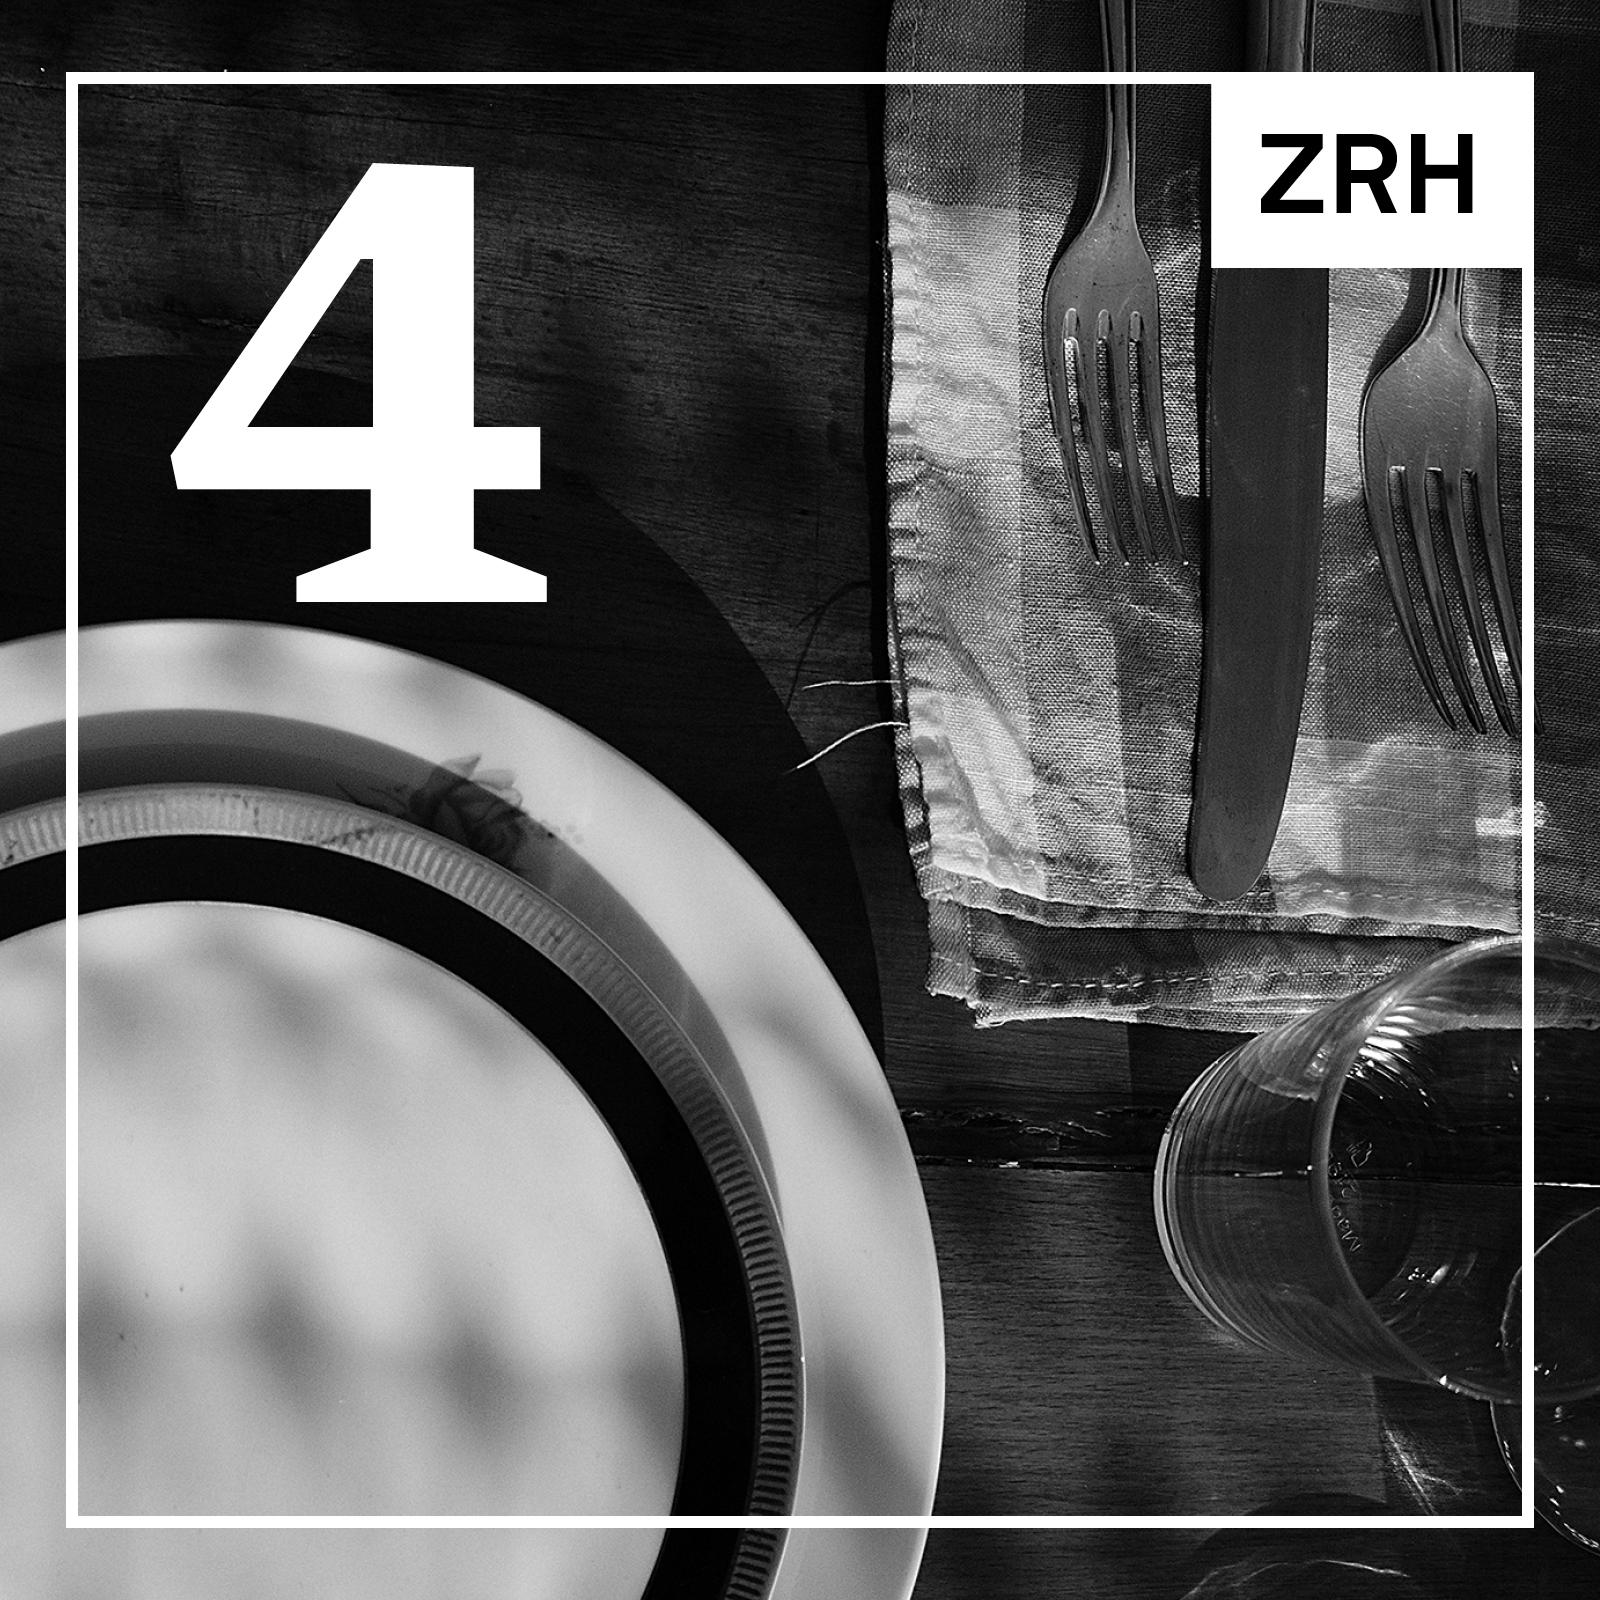 Bureau_Display_Identity_Graphic_Design_Grafik_Visual_Communication_Lucerne_Zurich_4_ZRH_Thumb